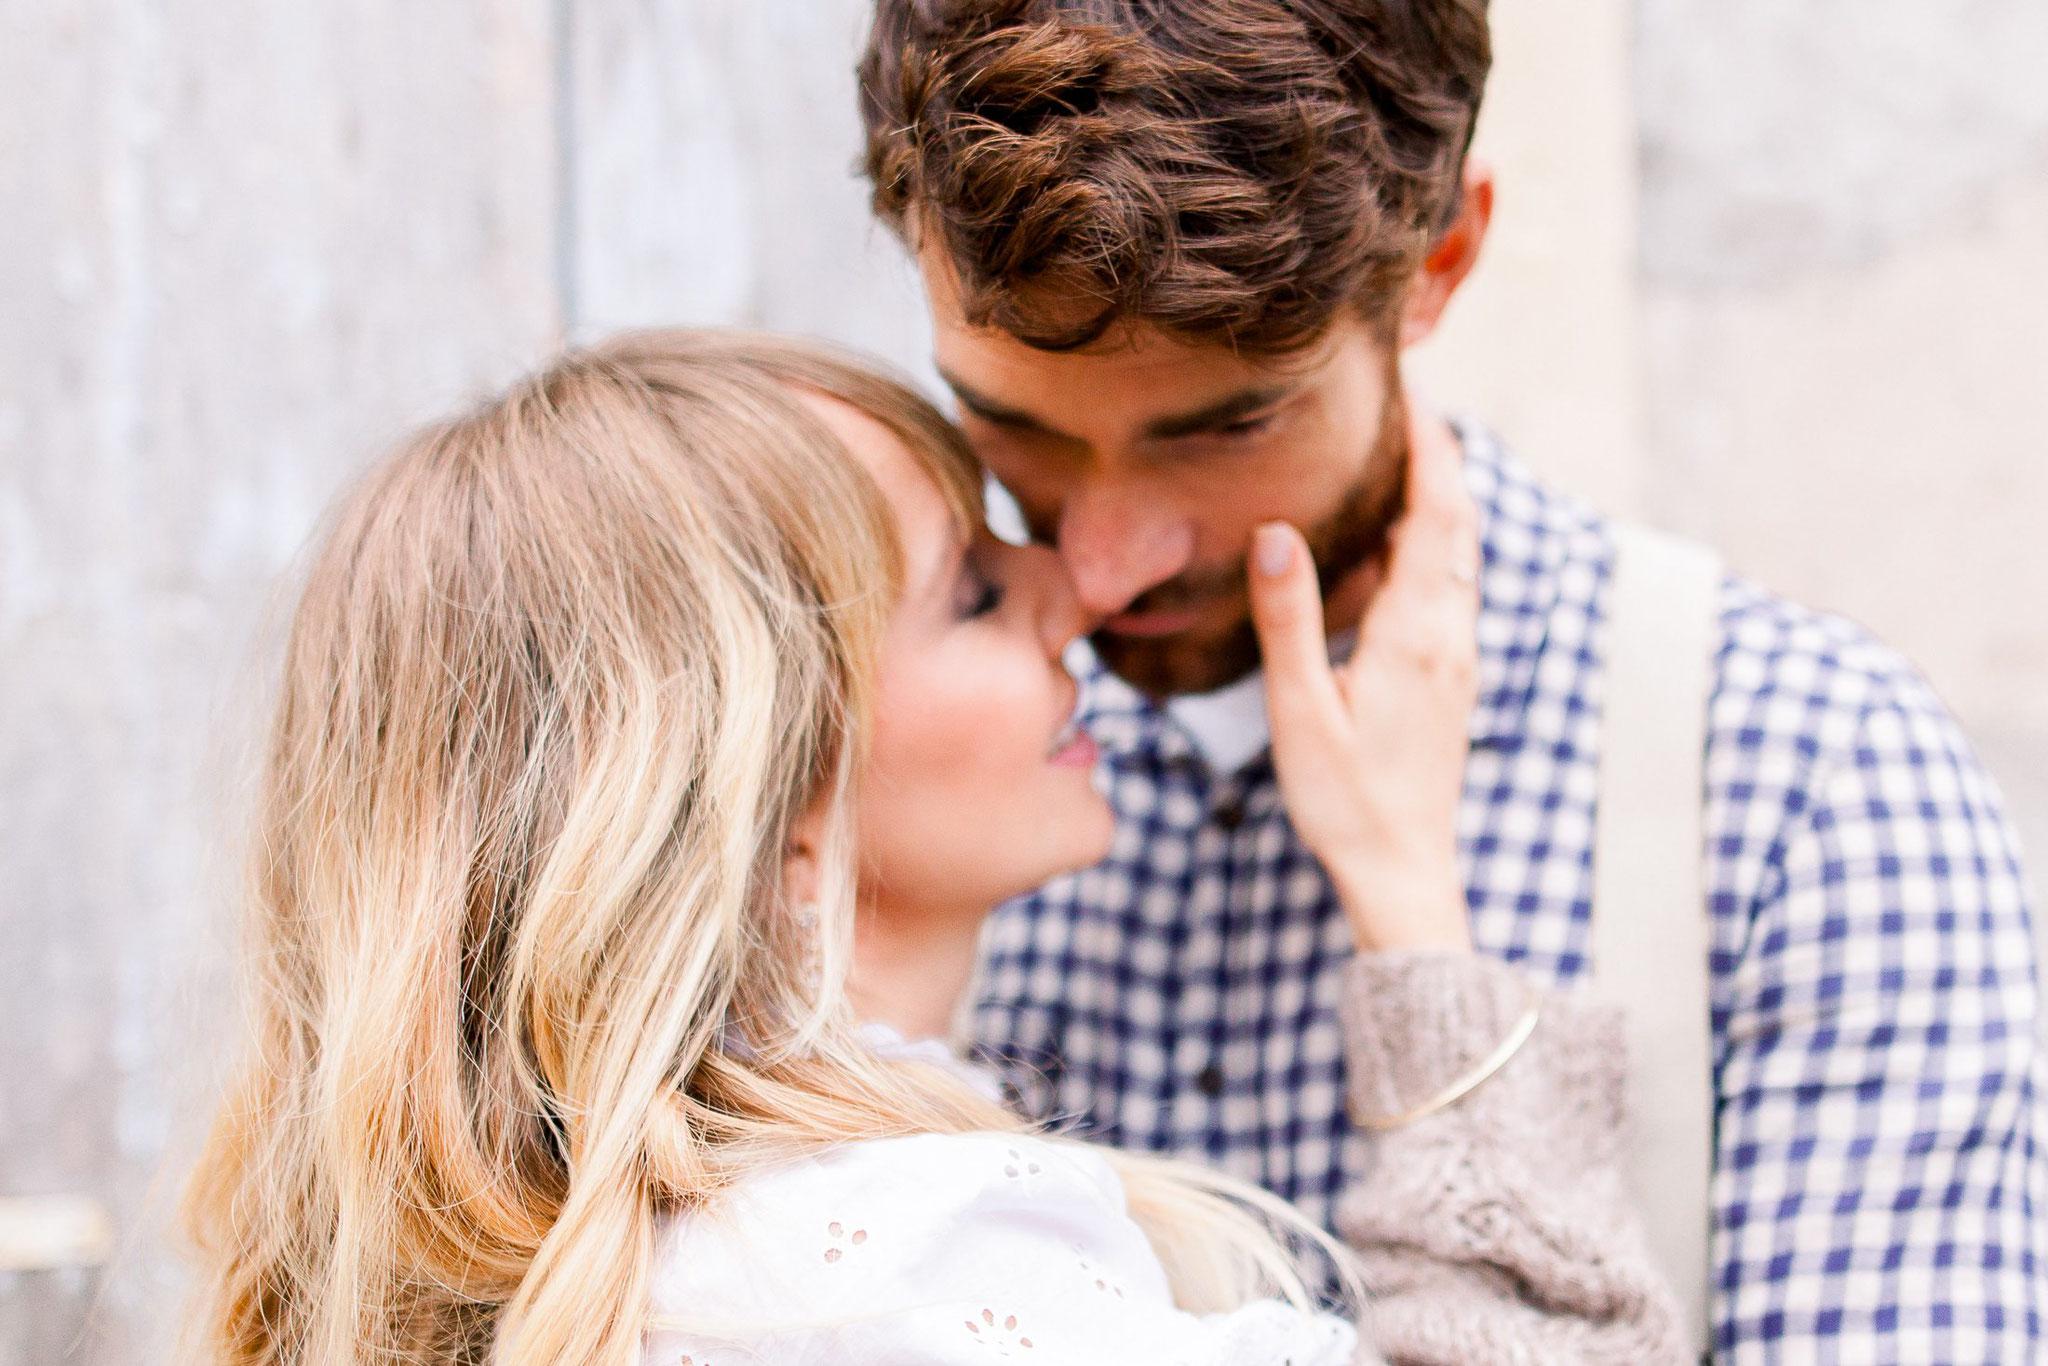 verlobungsshooting in Italien hochzeitsfotograf Jane weber boho chic holzfällerhemd kariertes Hemd Bräutigam verlobter